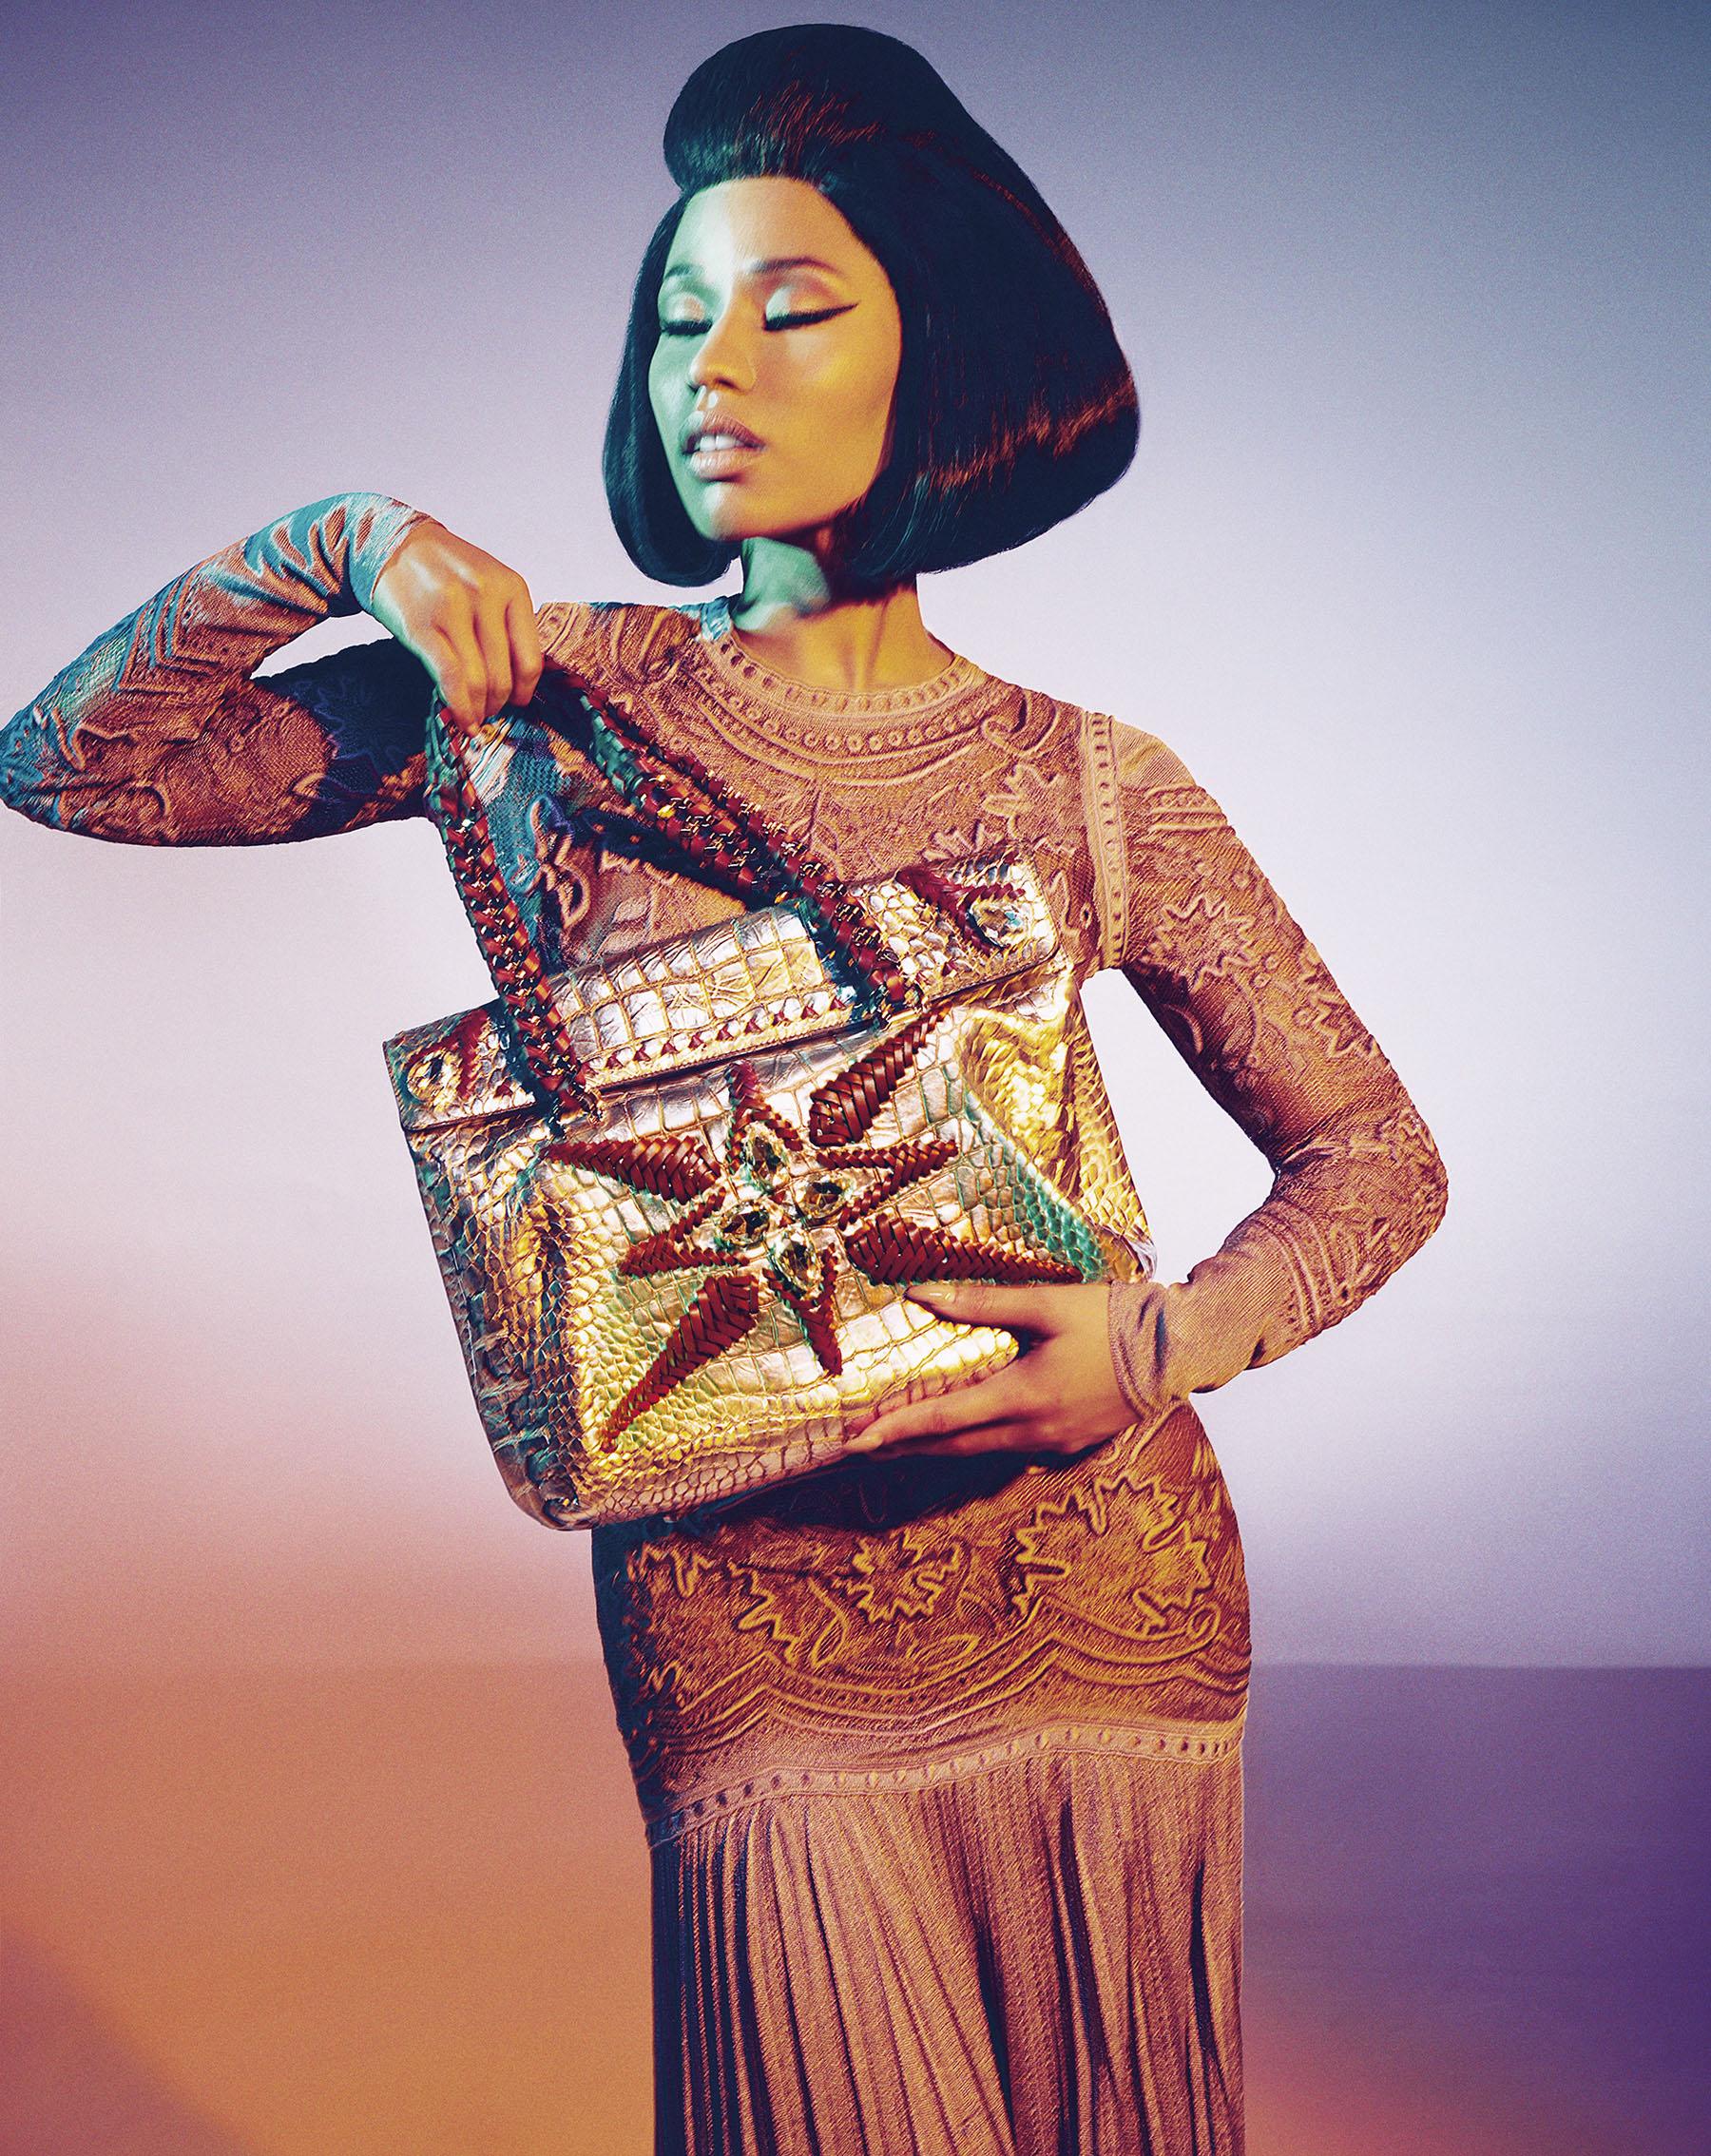 wholesale dealer 96a5e 6e345 Roberto Cavalli photo shoot | Nicki Minaj Wiki | FANDOM ...